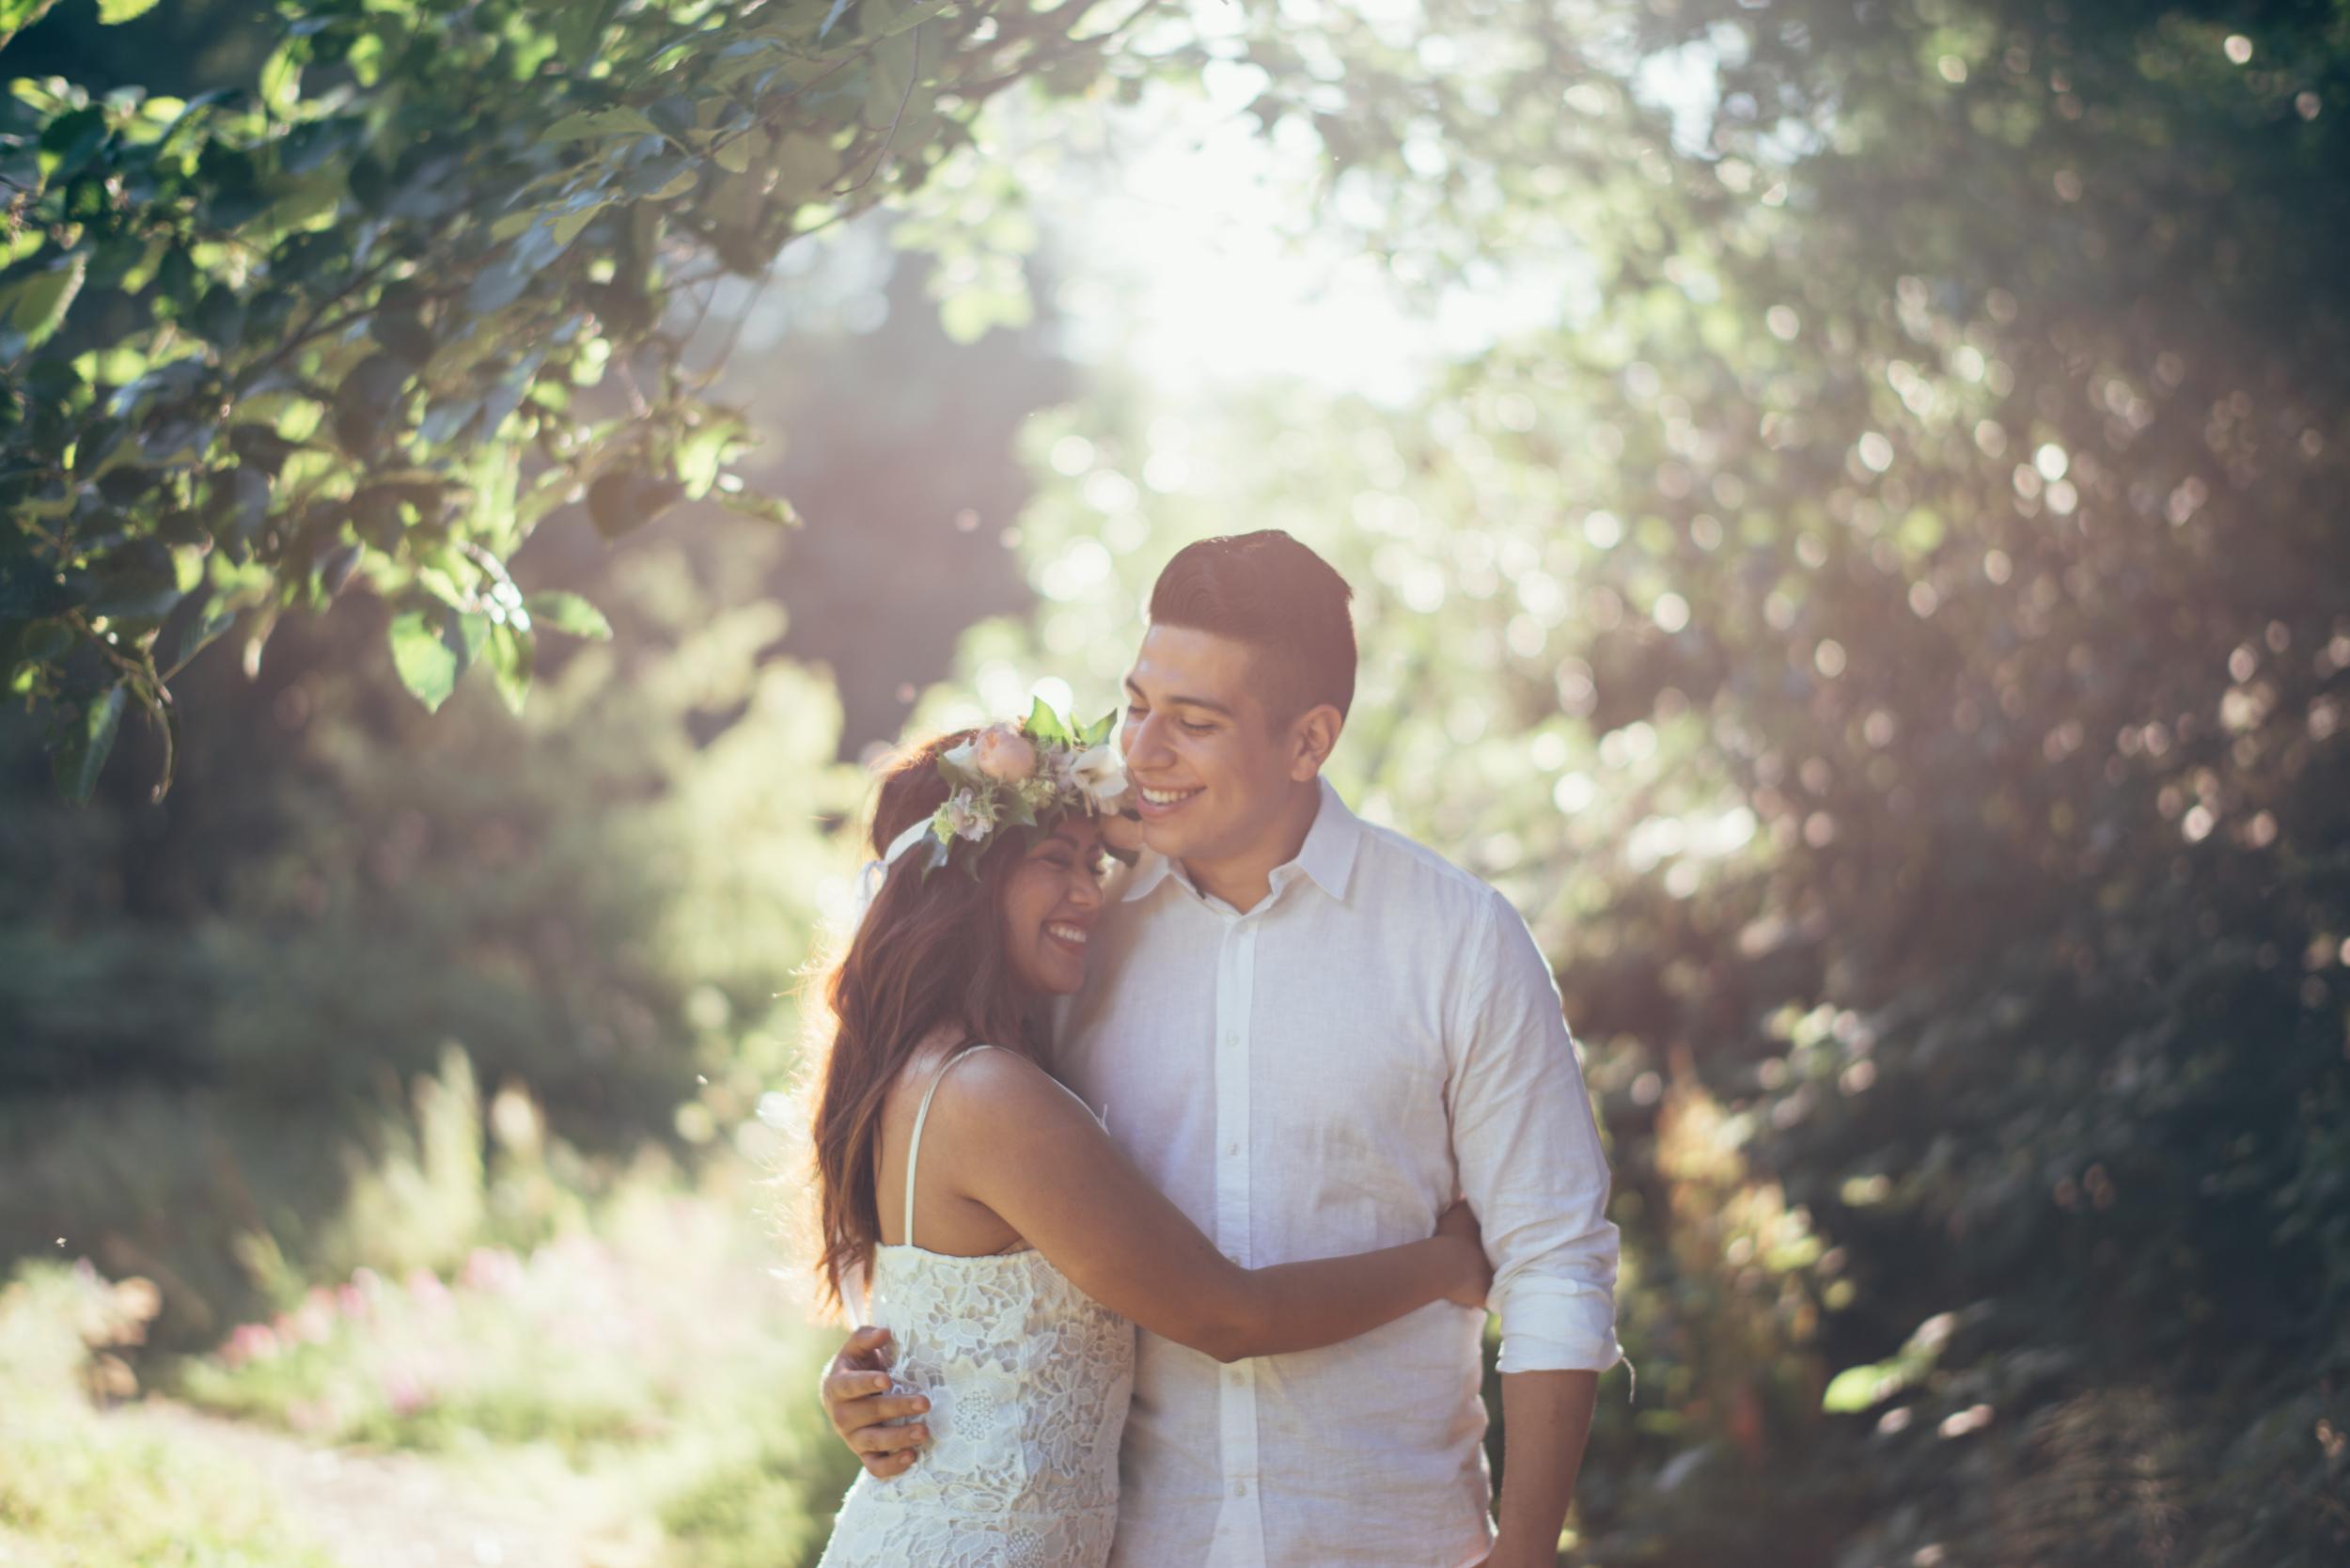 Ricardo & Stephanie - Engagement - © Dallas Kolotylo Photography - 56.jpg